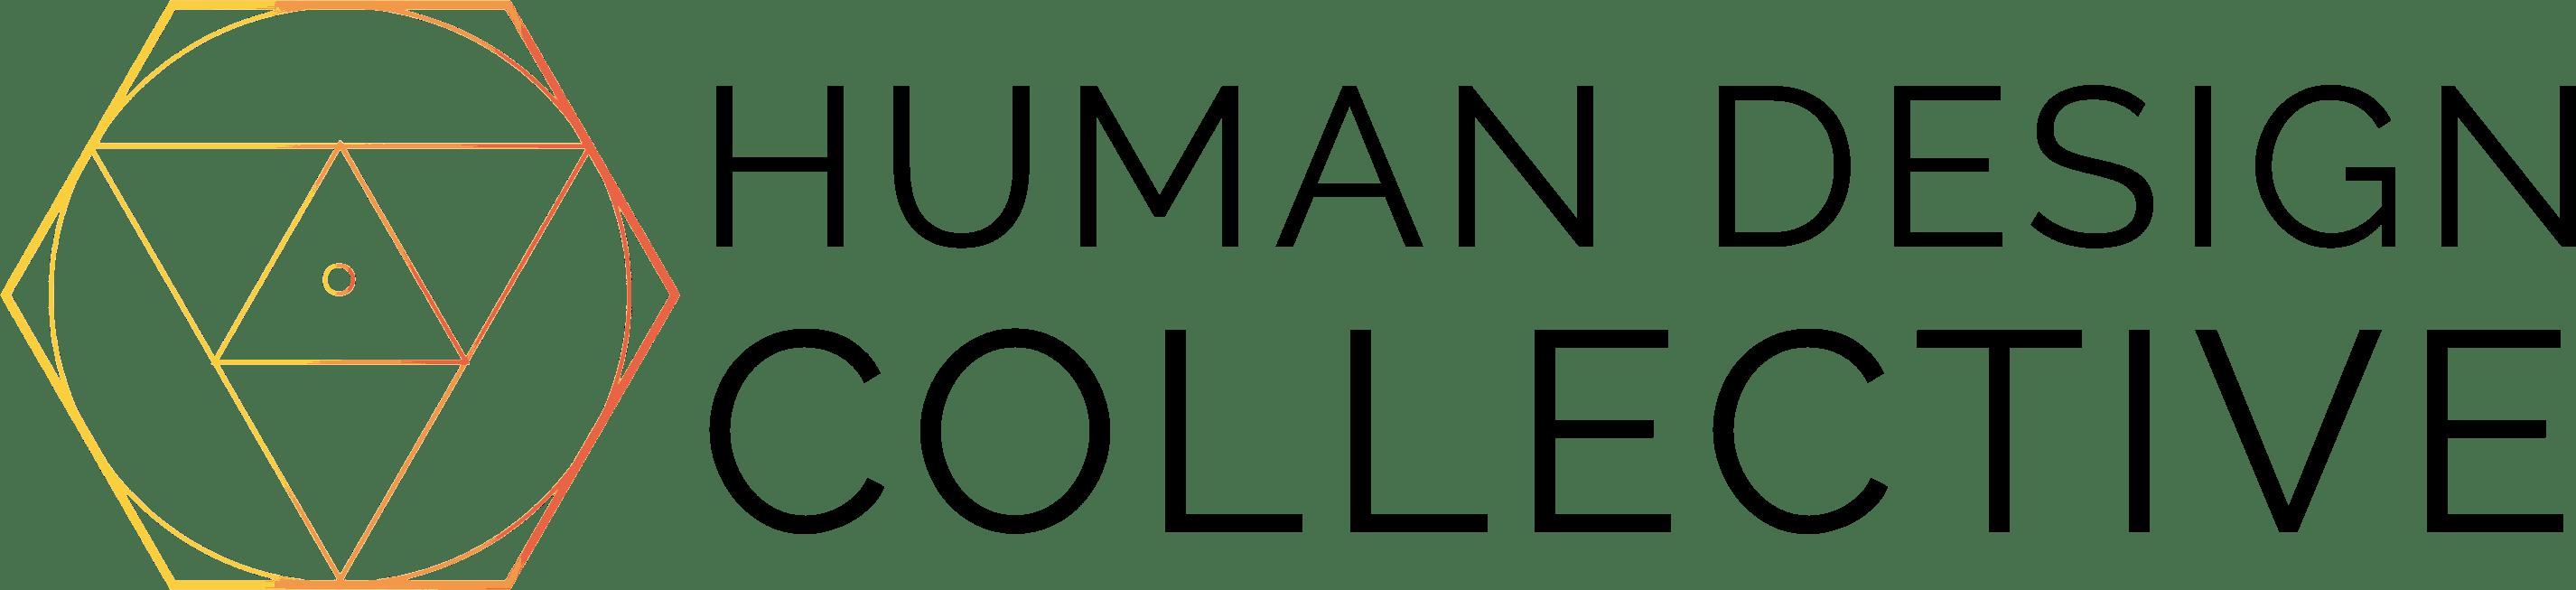 Human Design Collective